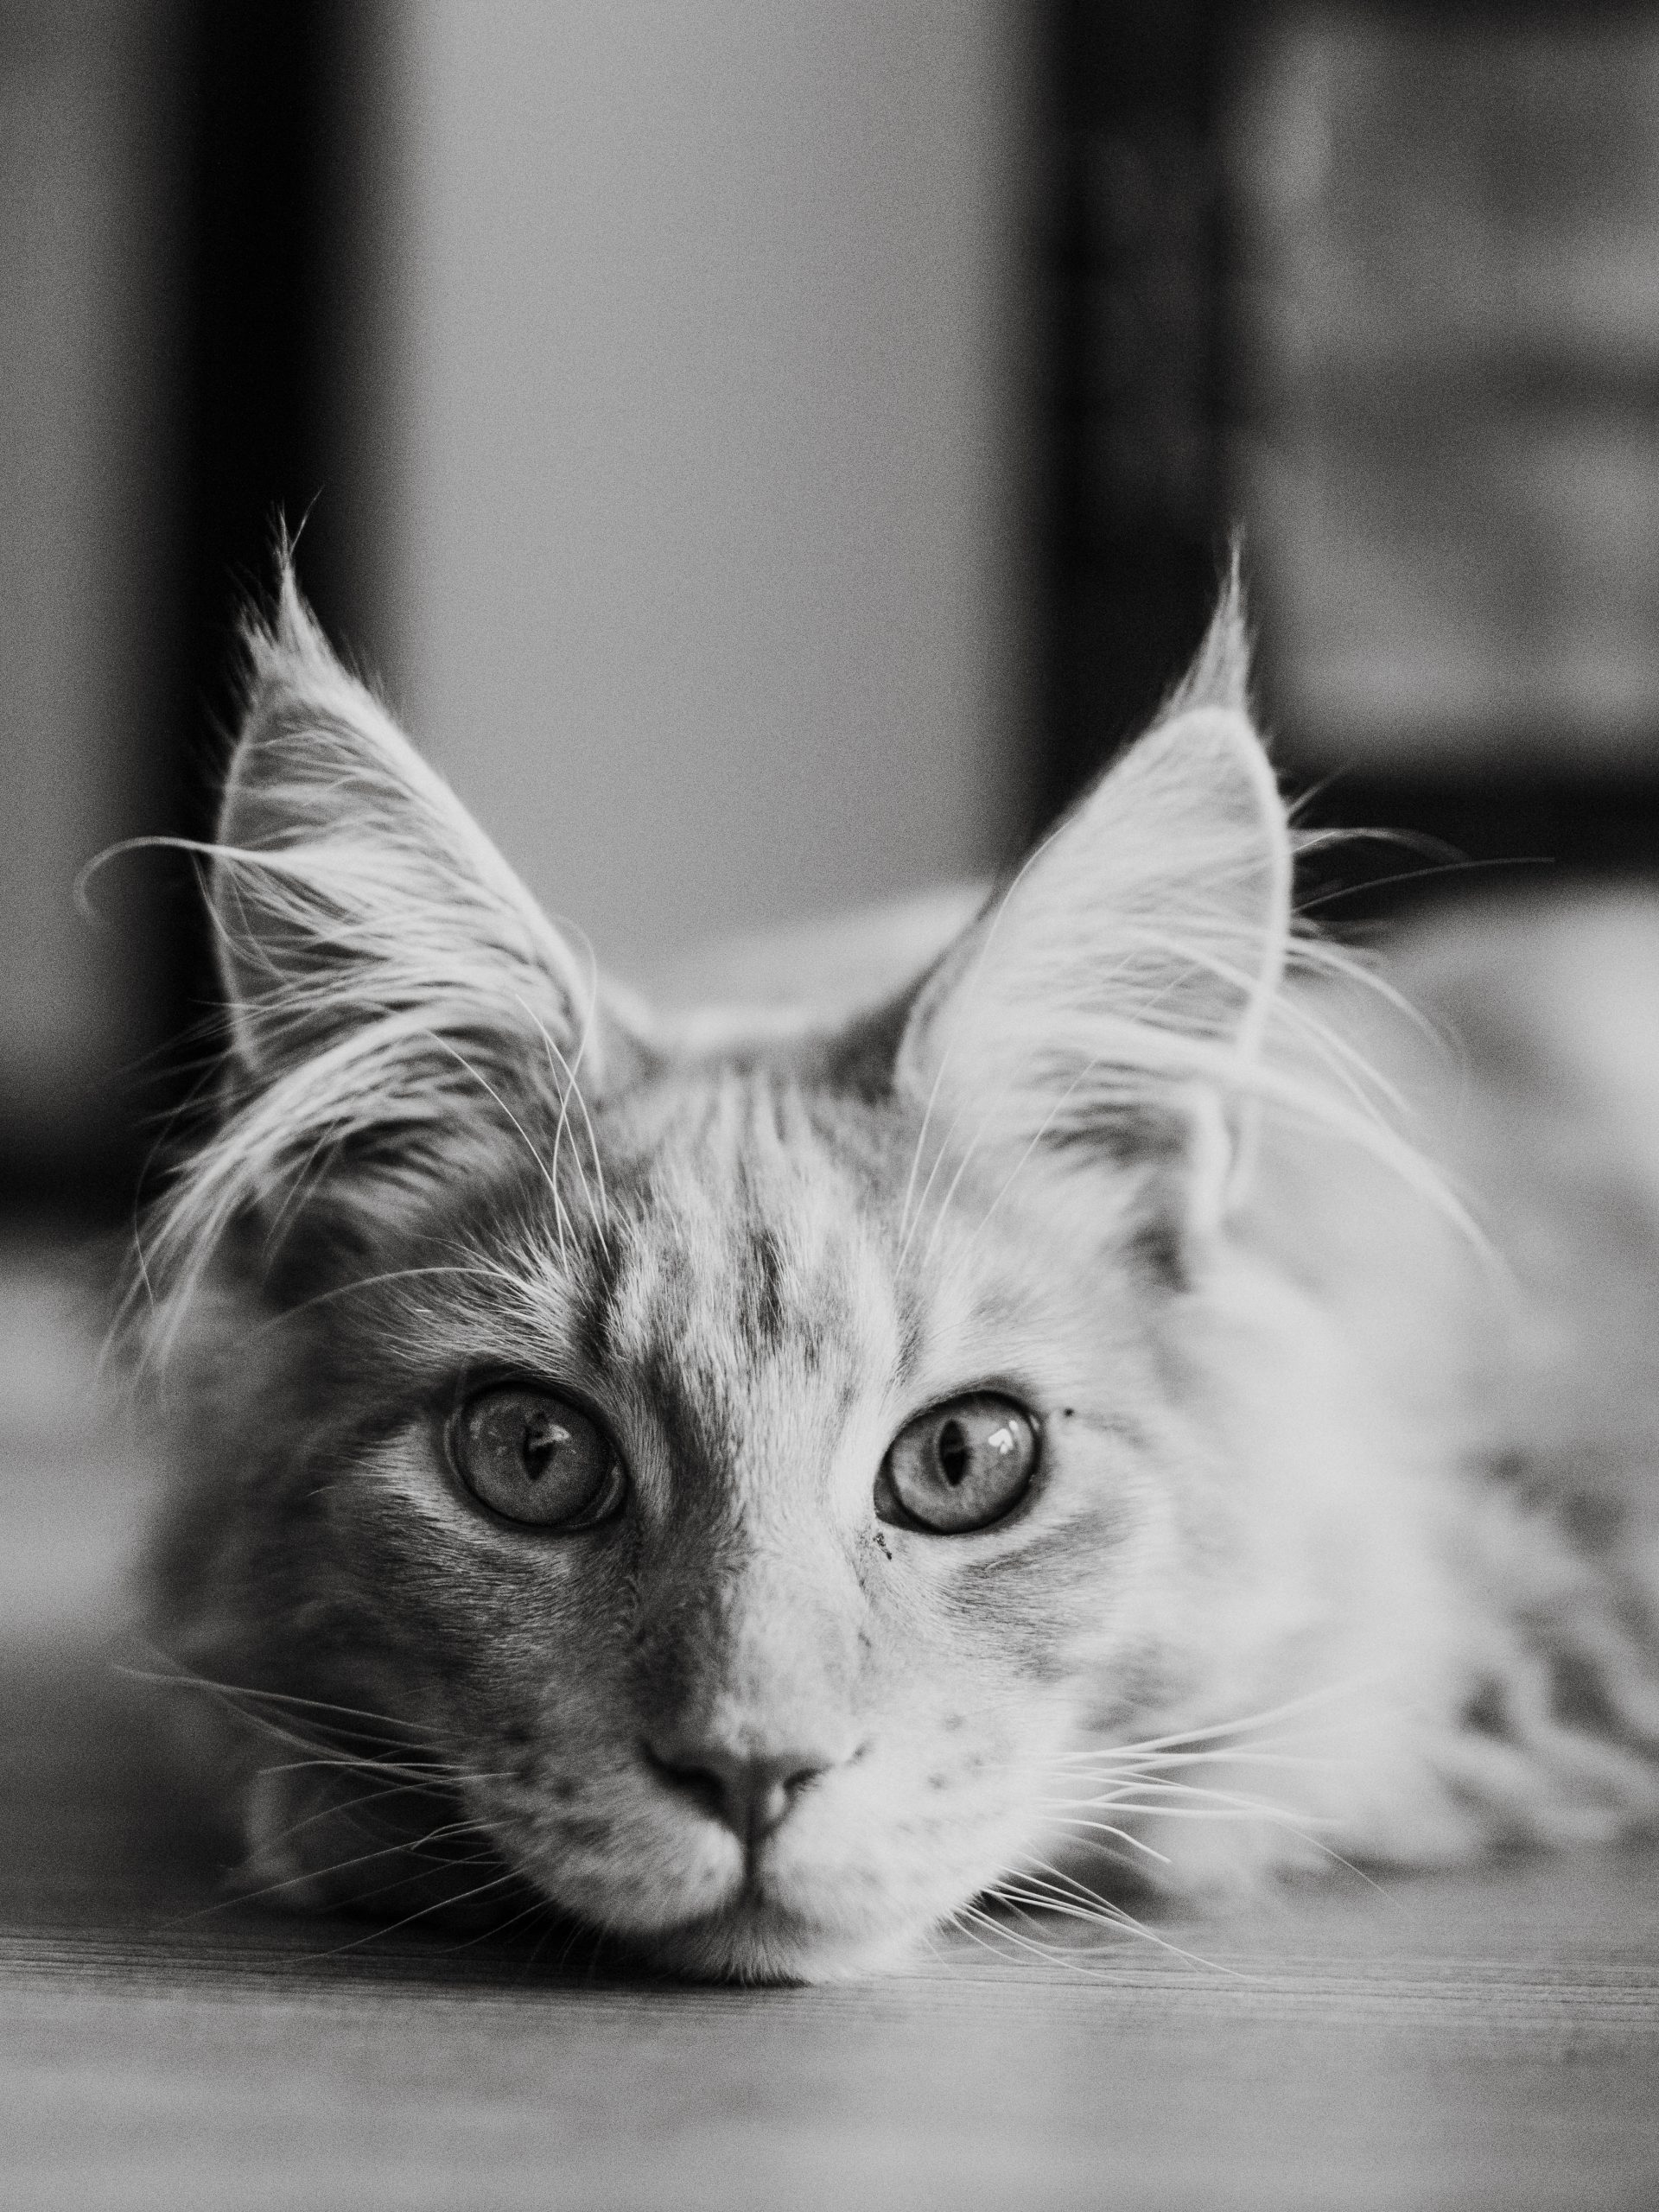 portret fotografie from Mathilda